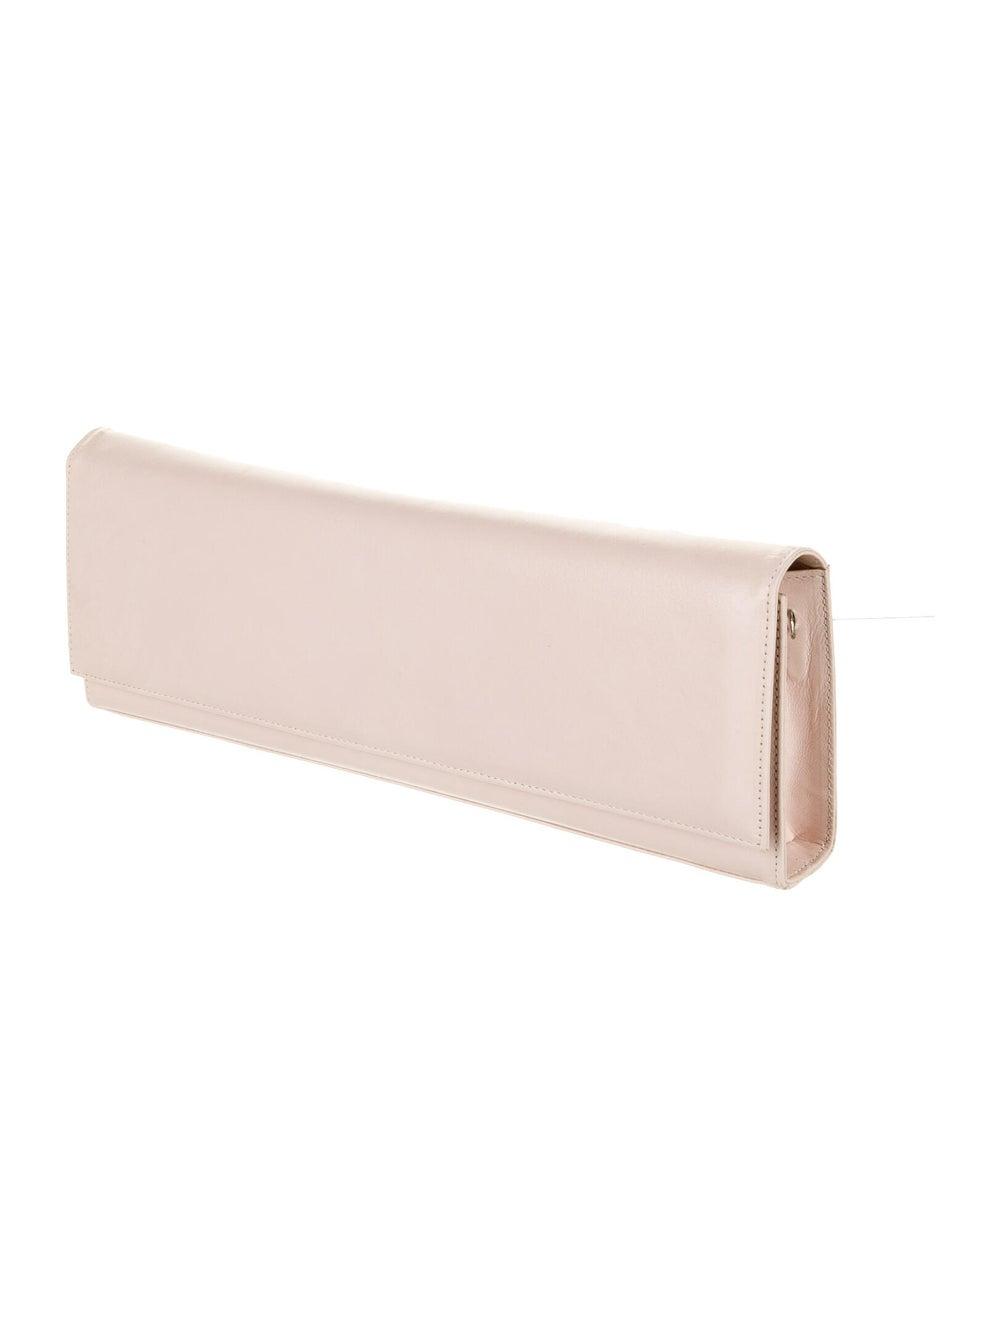 Stuart Weitzman Leather Flap Clutch Pink - image 3